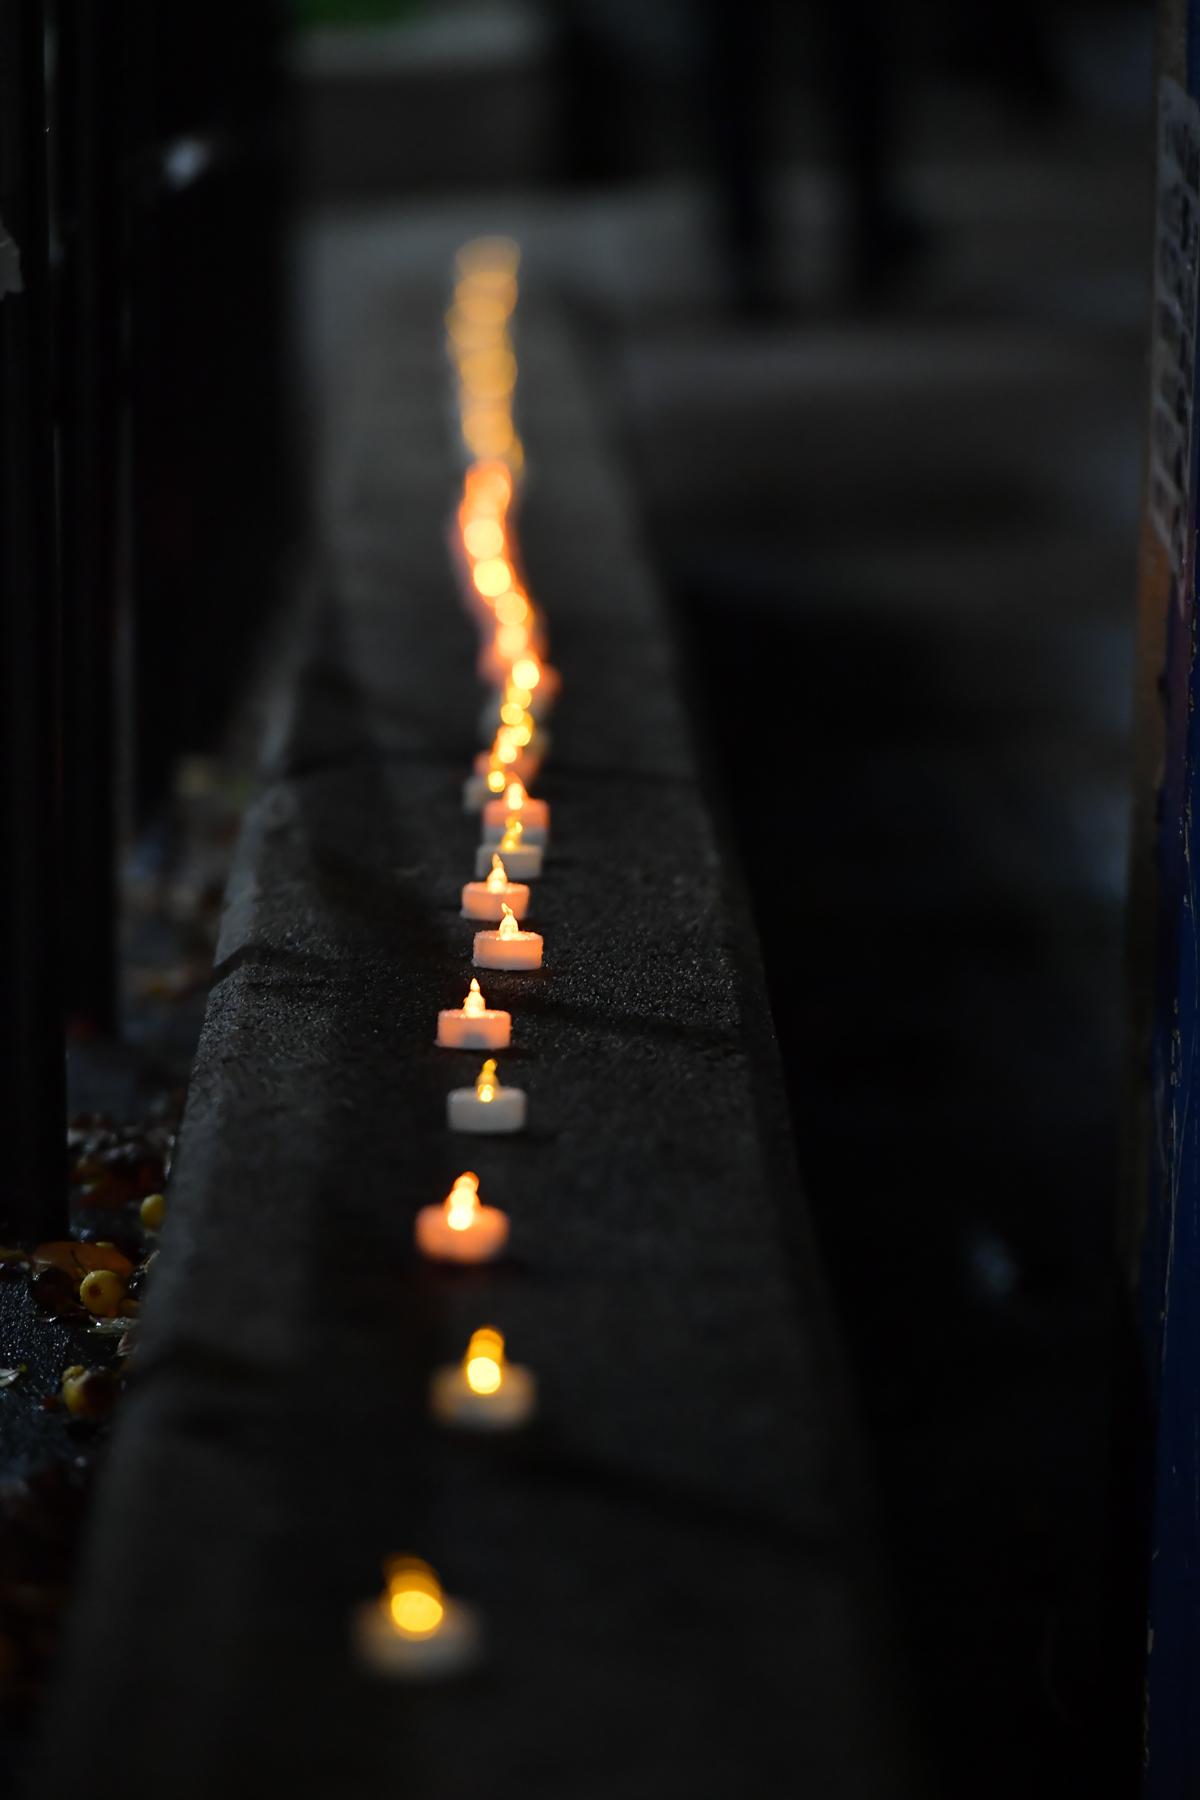 moas-4th-annual-candlelight-memorial-vigil_45139370342_o.jpg